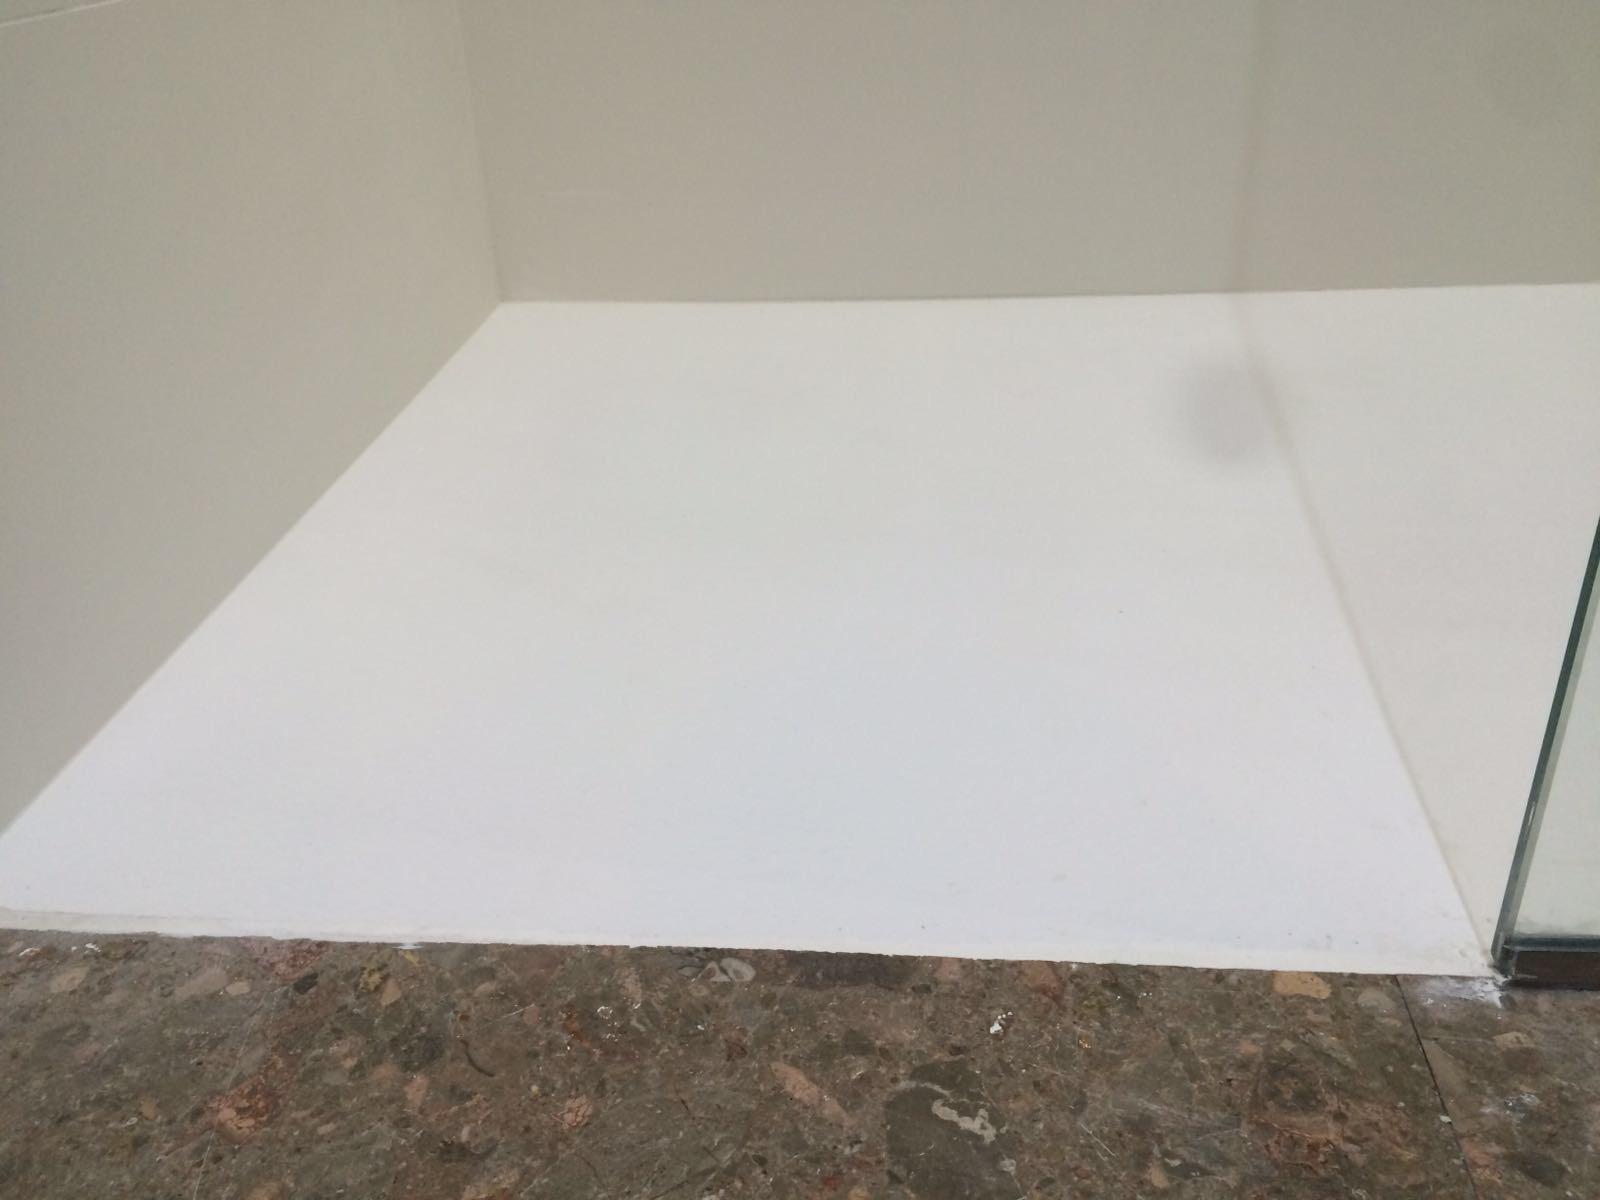 Junta entre pavimento y plato de ducha 10decoracion for Instalar plato ducha resina